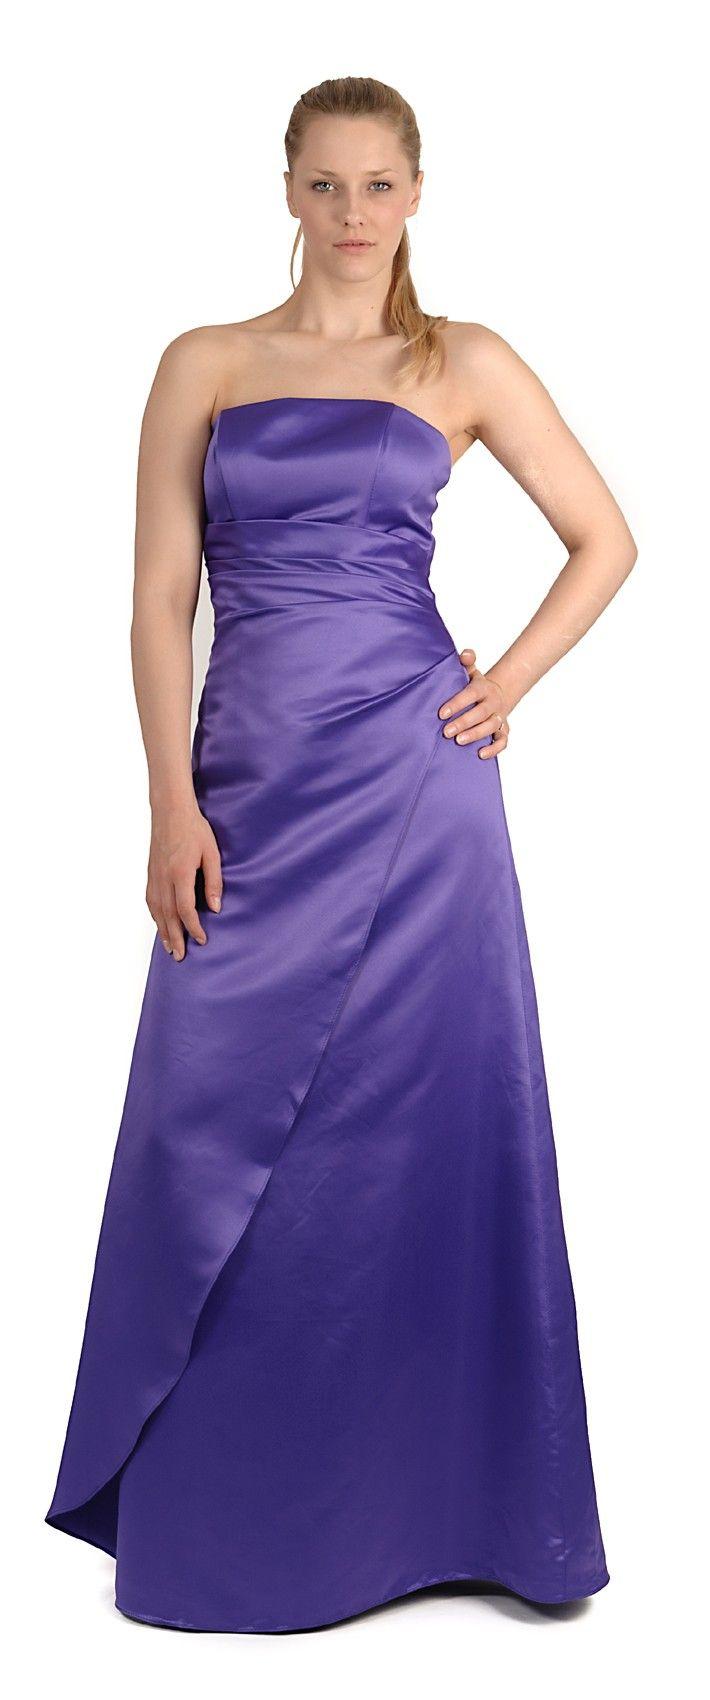 Cadbury purple childrens bridesmaid dresses uk images braidsmaid purple flower girl dresses sleevless for kids google search explore purple flower girl dresses and more ombrellifo Images